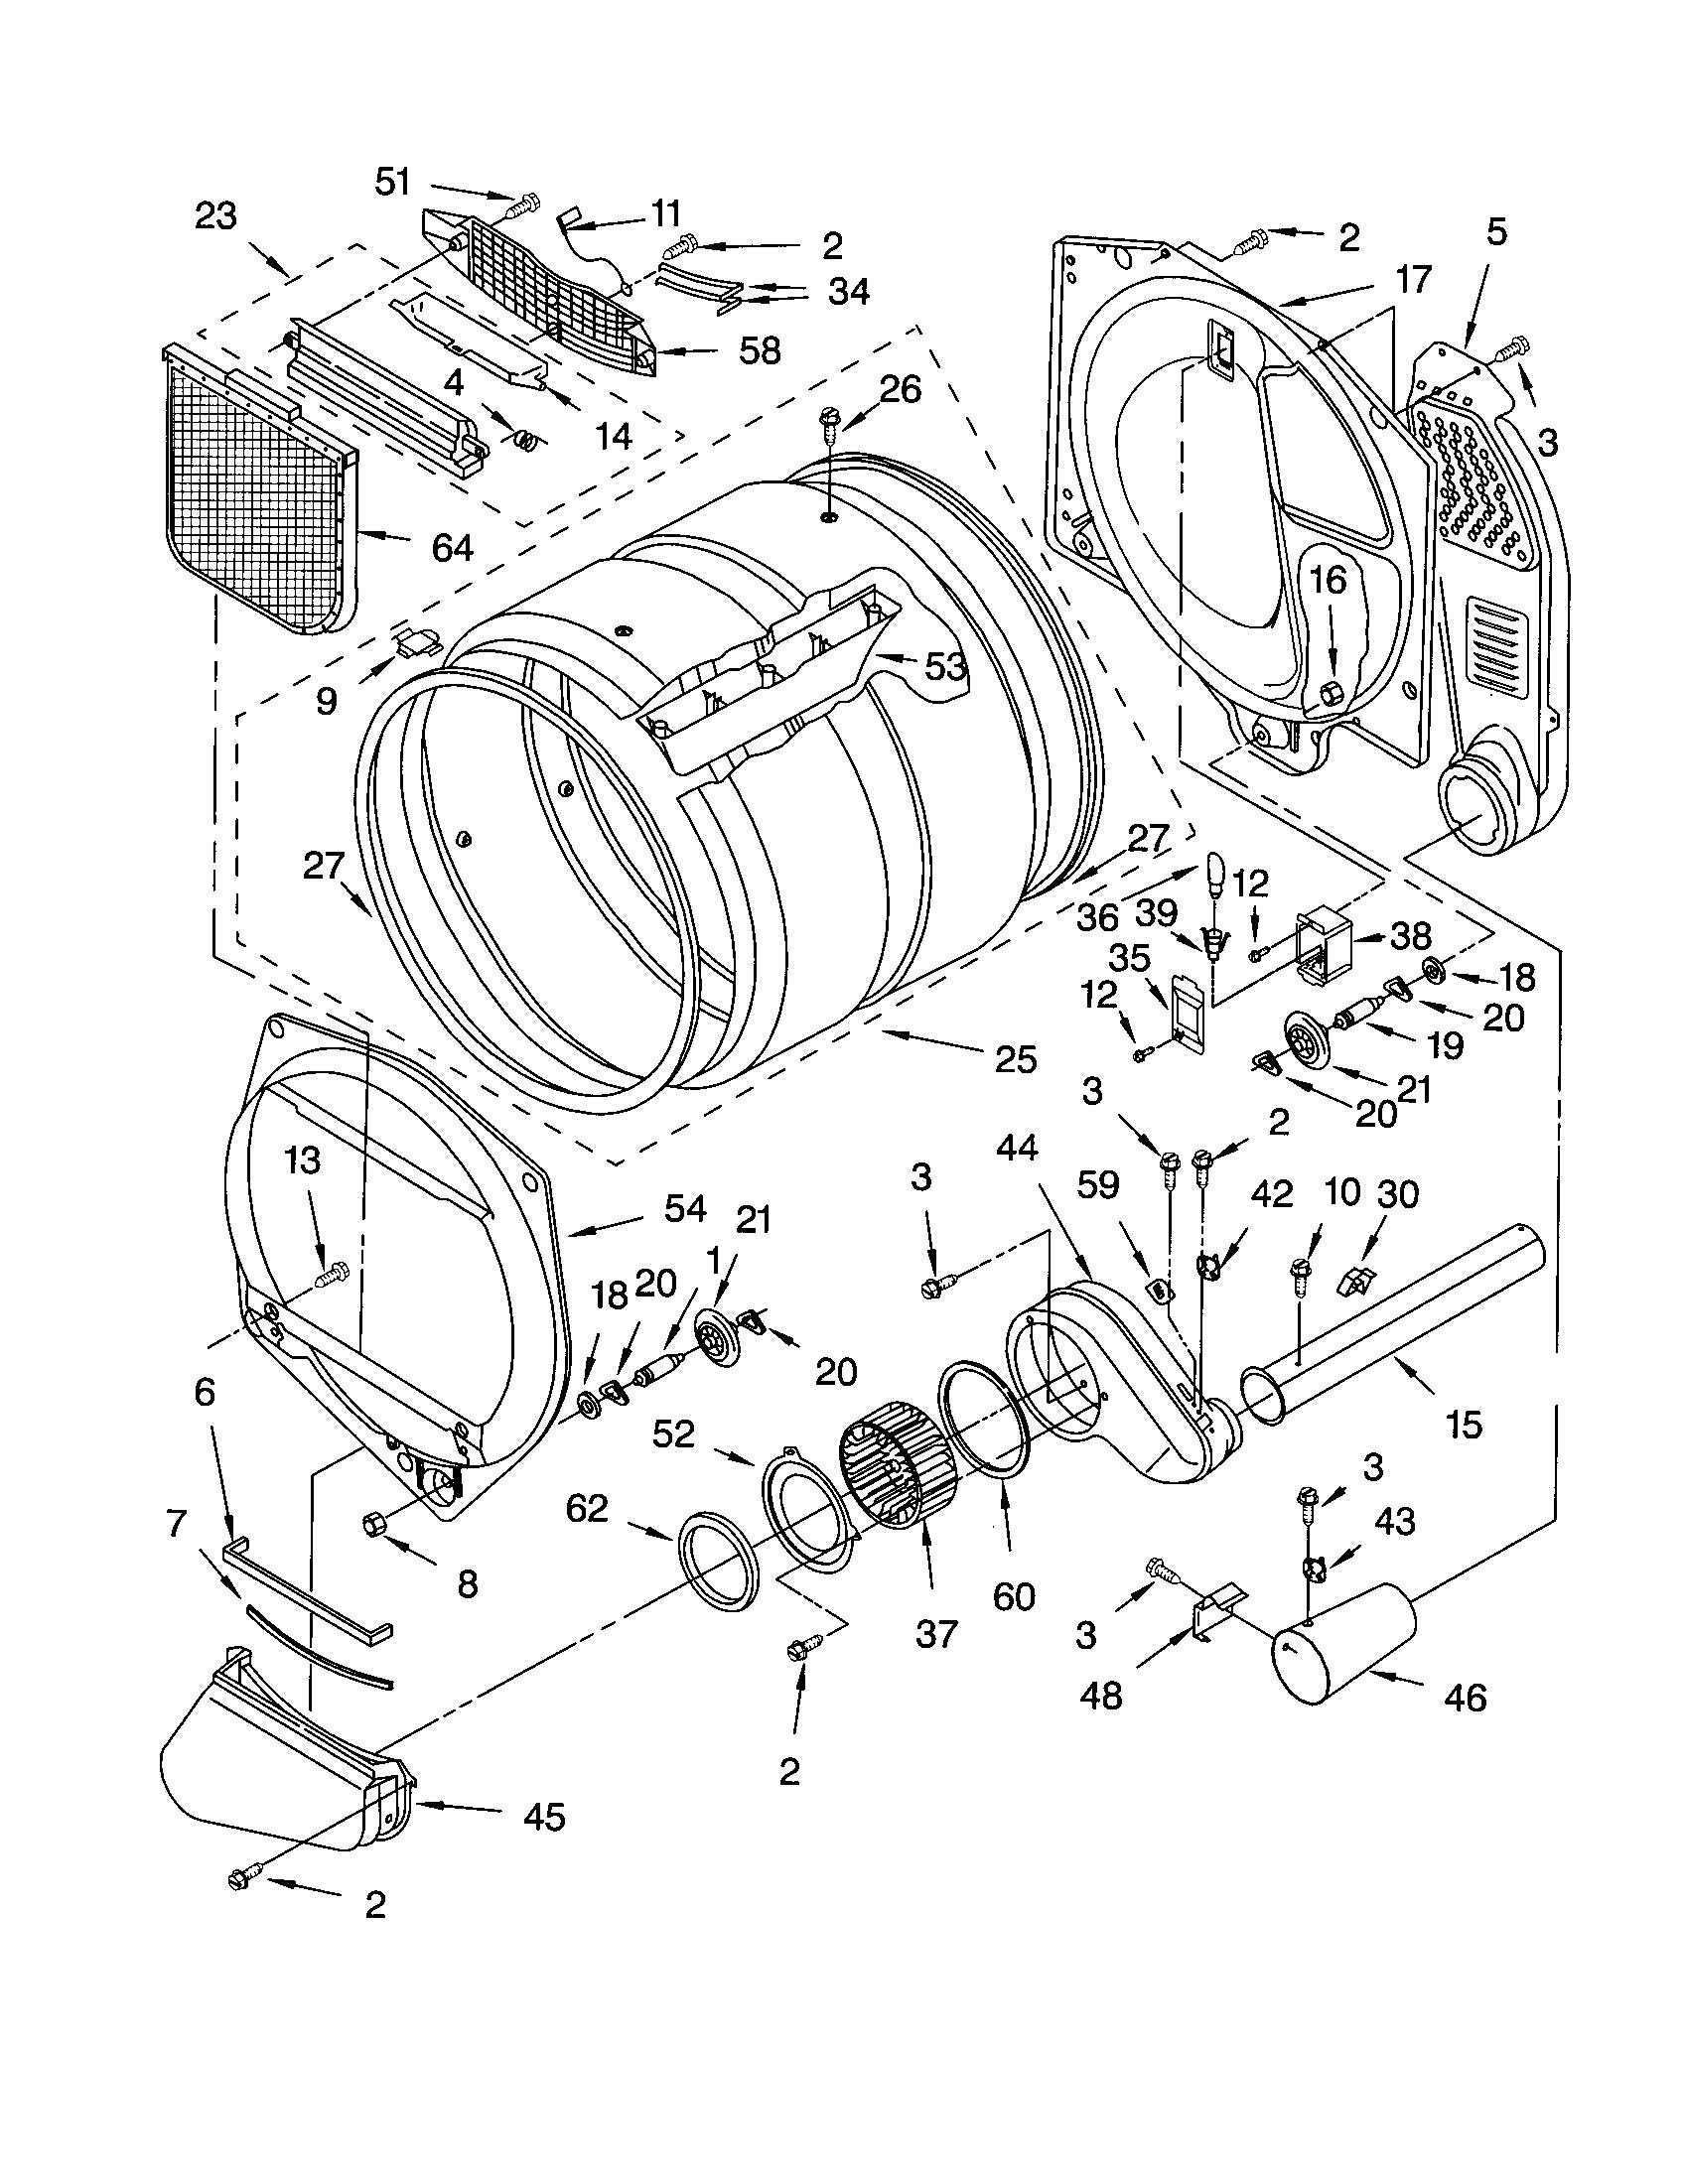 Kenmore 110.73034100 Dryer Thermal Cut-Off Fuse Kit